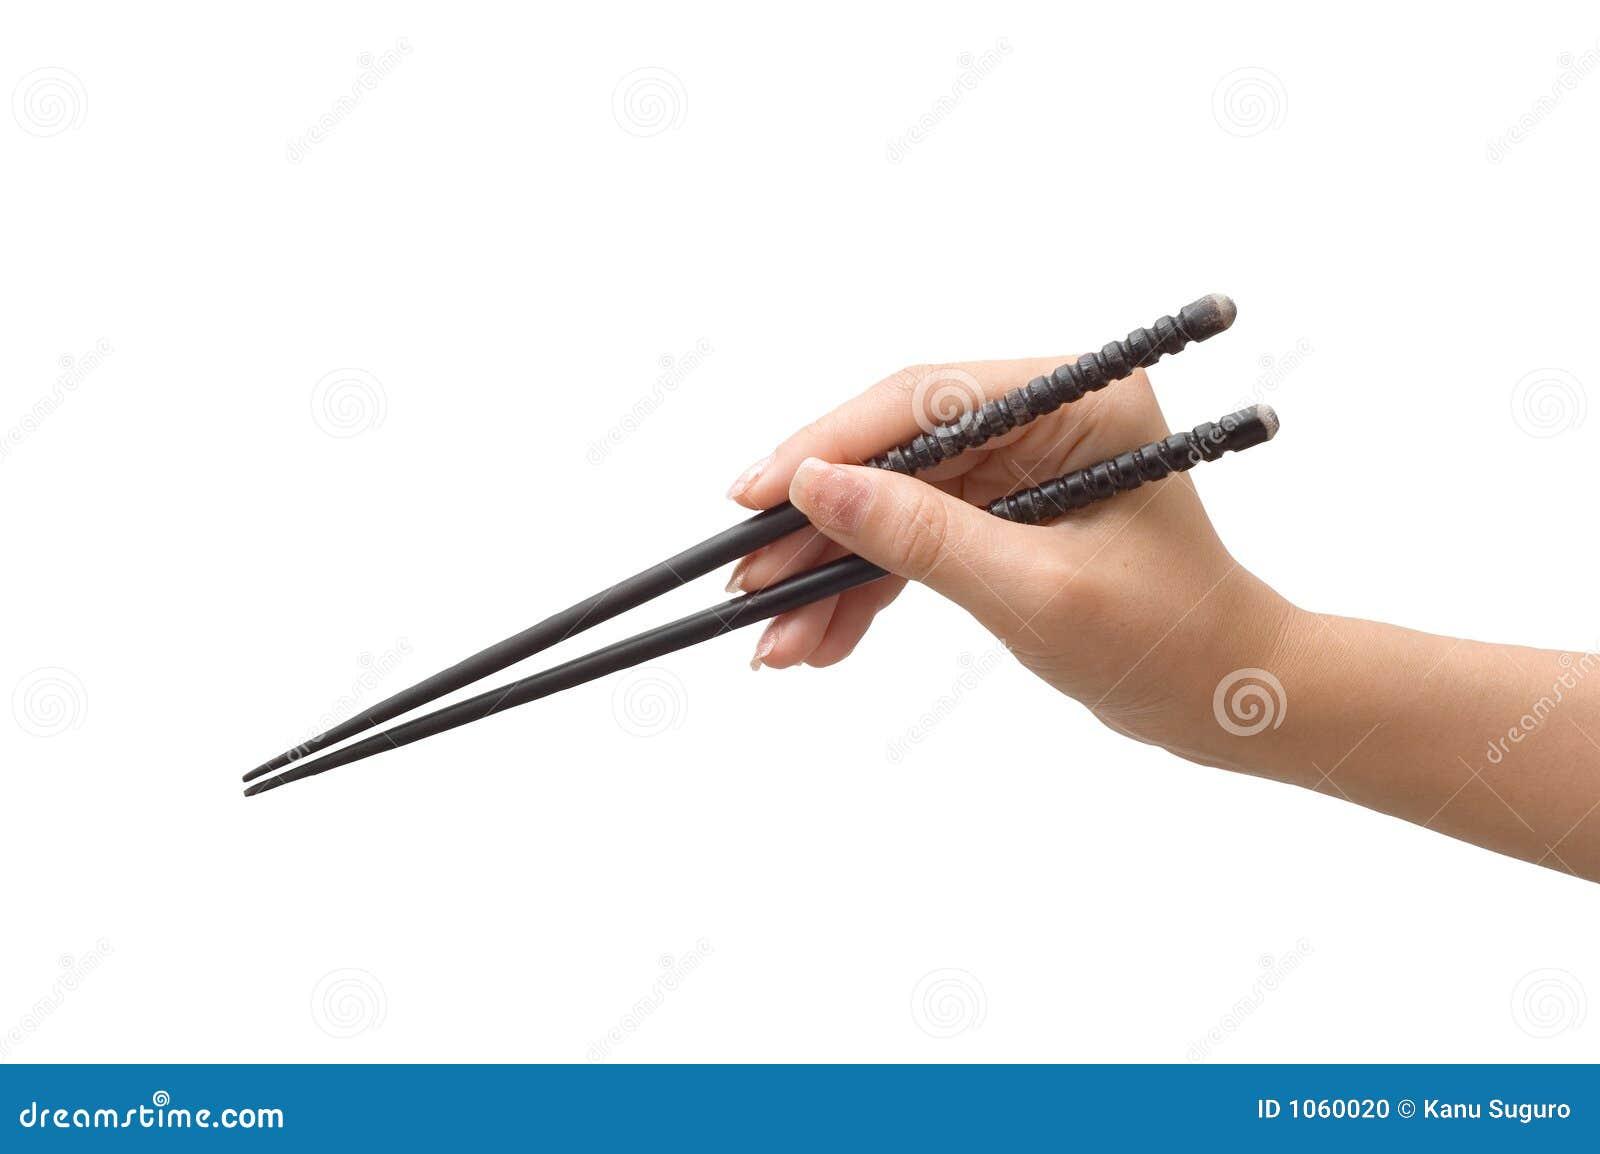 Hand Holding Chopsticks Stock Photo Image 1060020